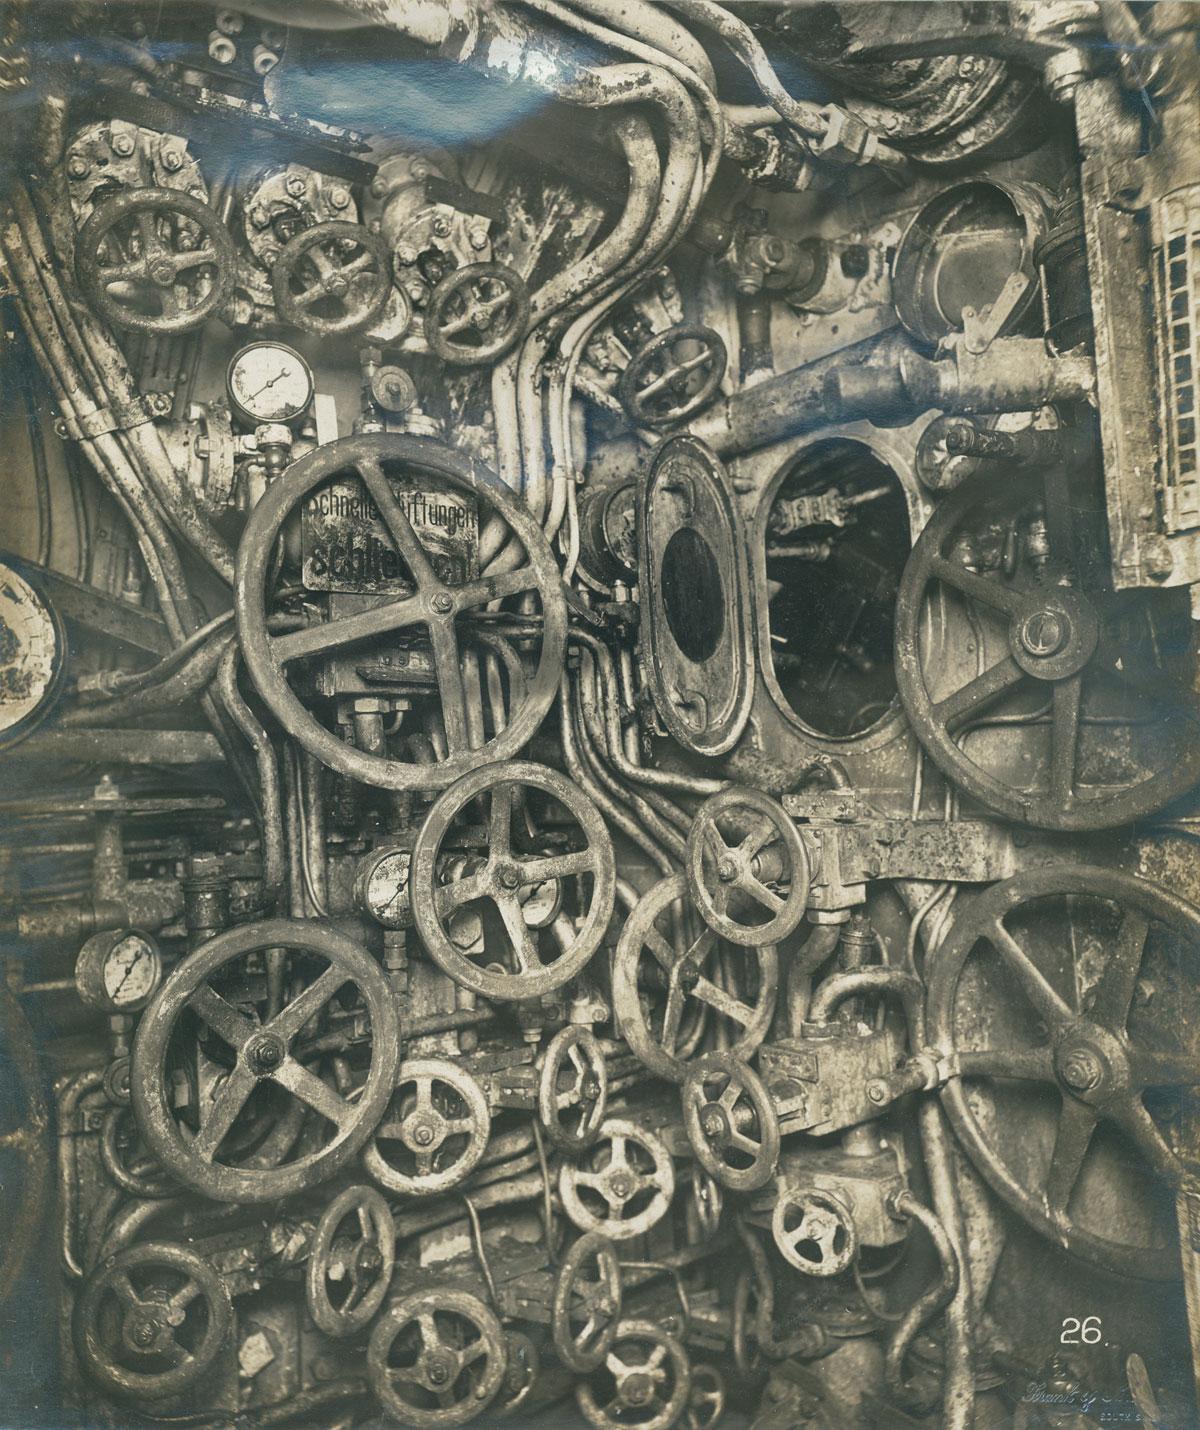 Control room of the UB-110 German submarine, 1918